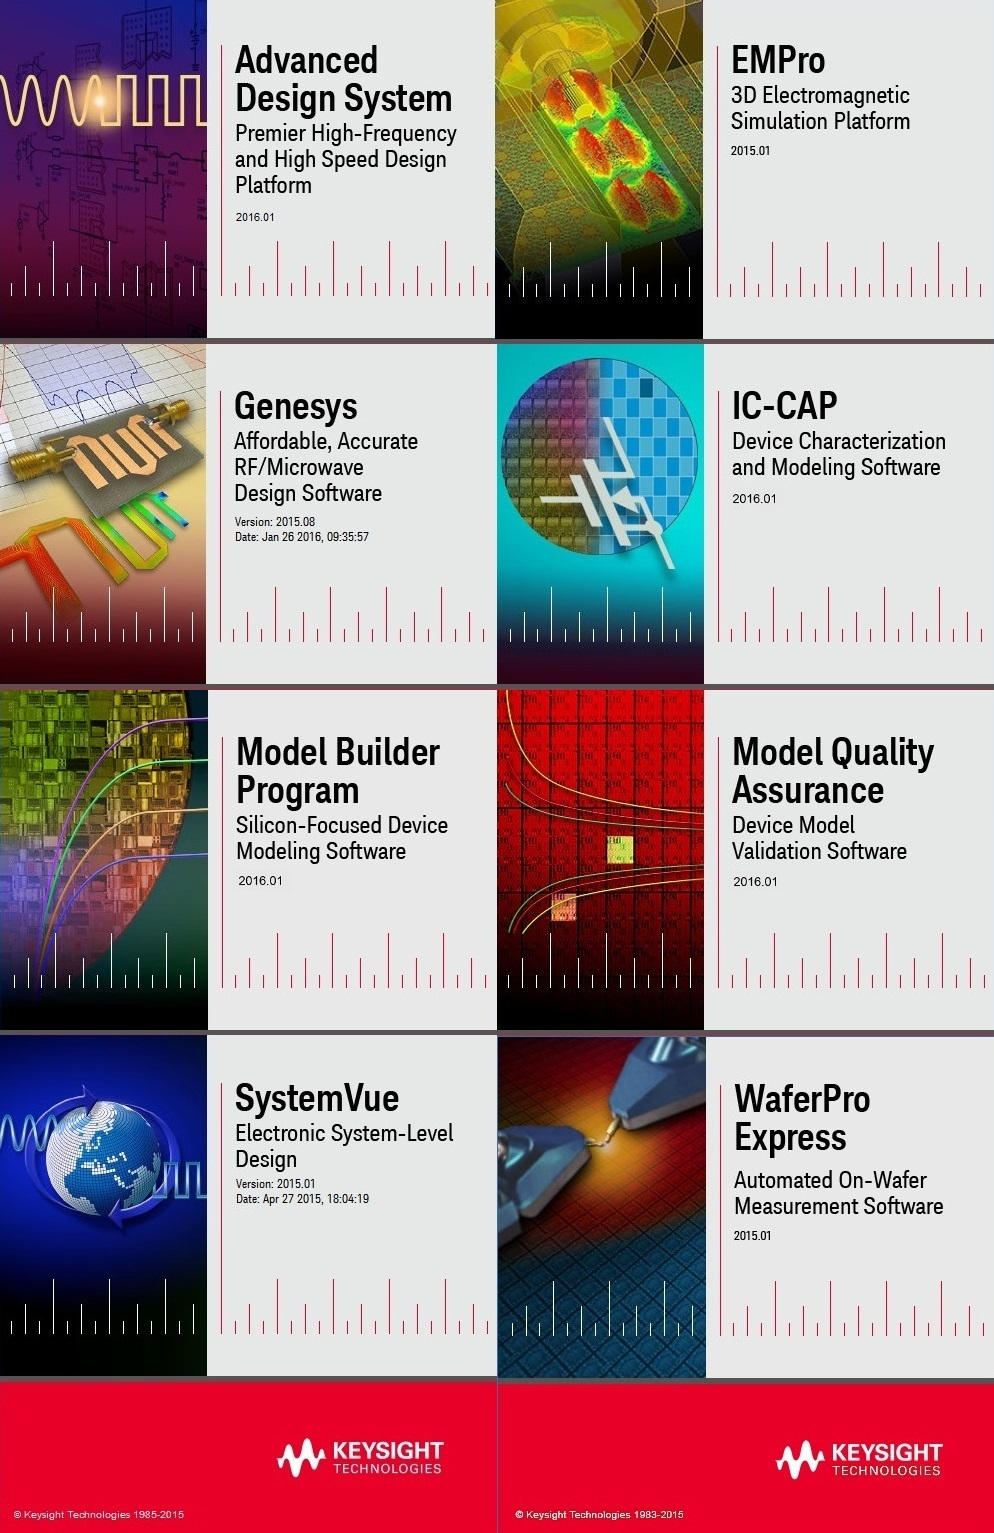 Keysight Suite 2015-2016 (ADS-EMPro-Wafer-Pro-ICAP-SystemVue-MBP-MQA)